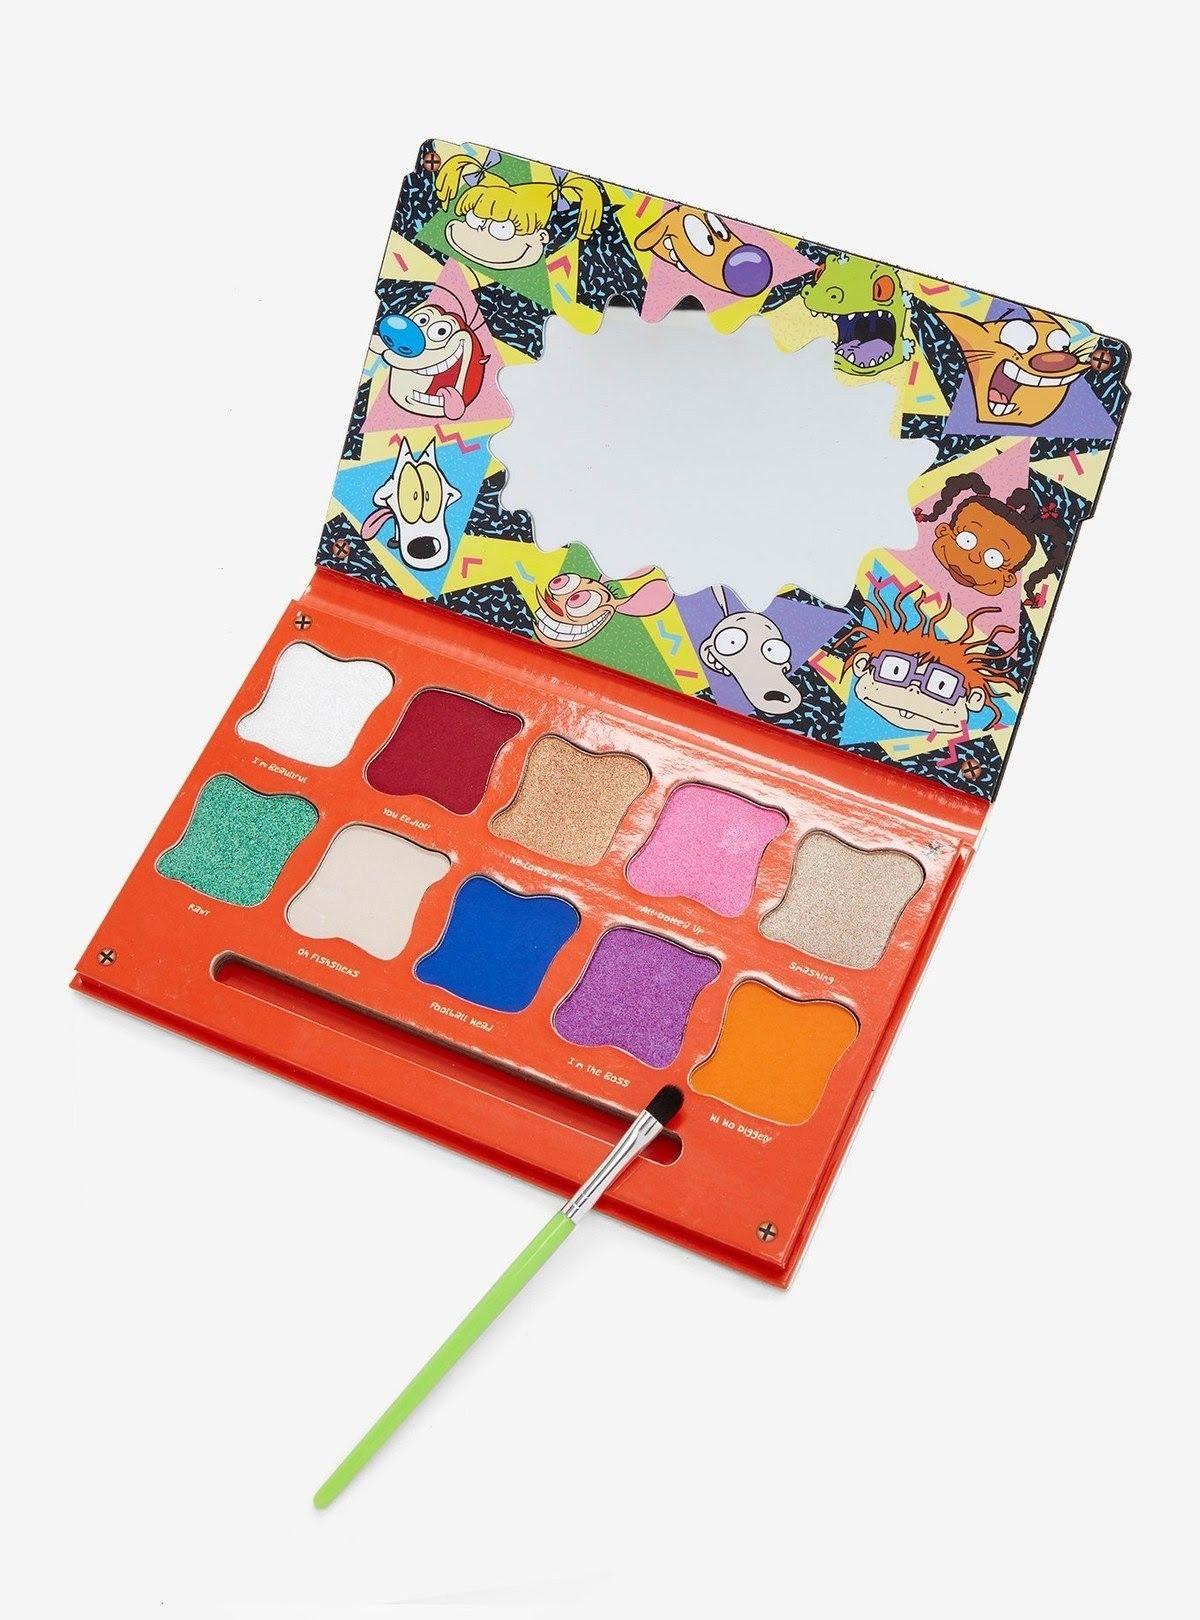 Hot Topic Nickelodeon Eyeshadow Palette Eyeshadow